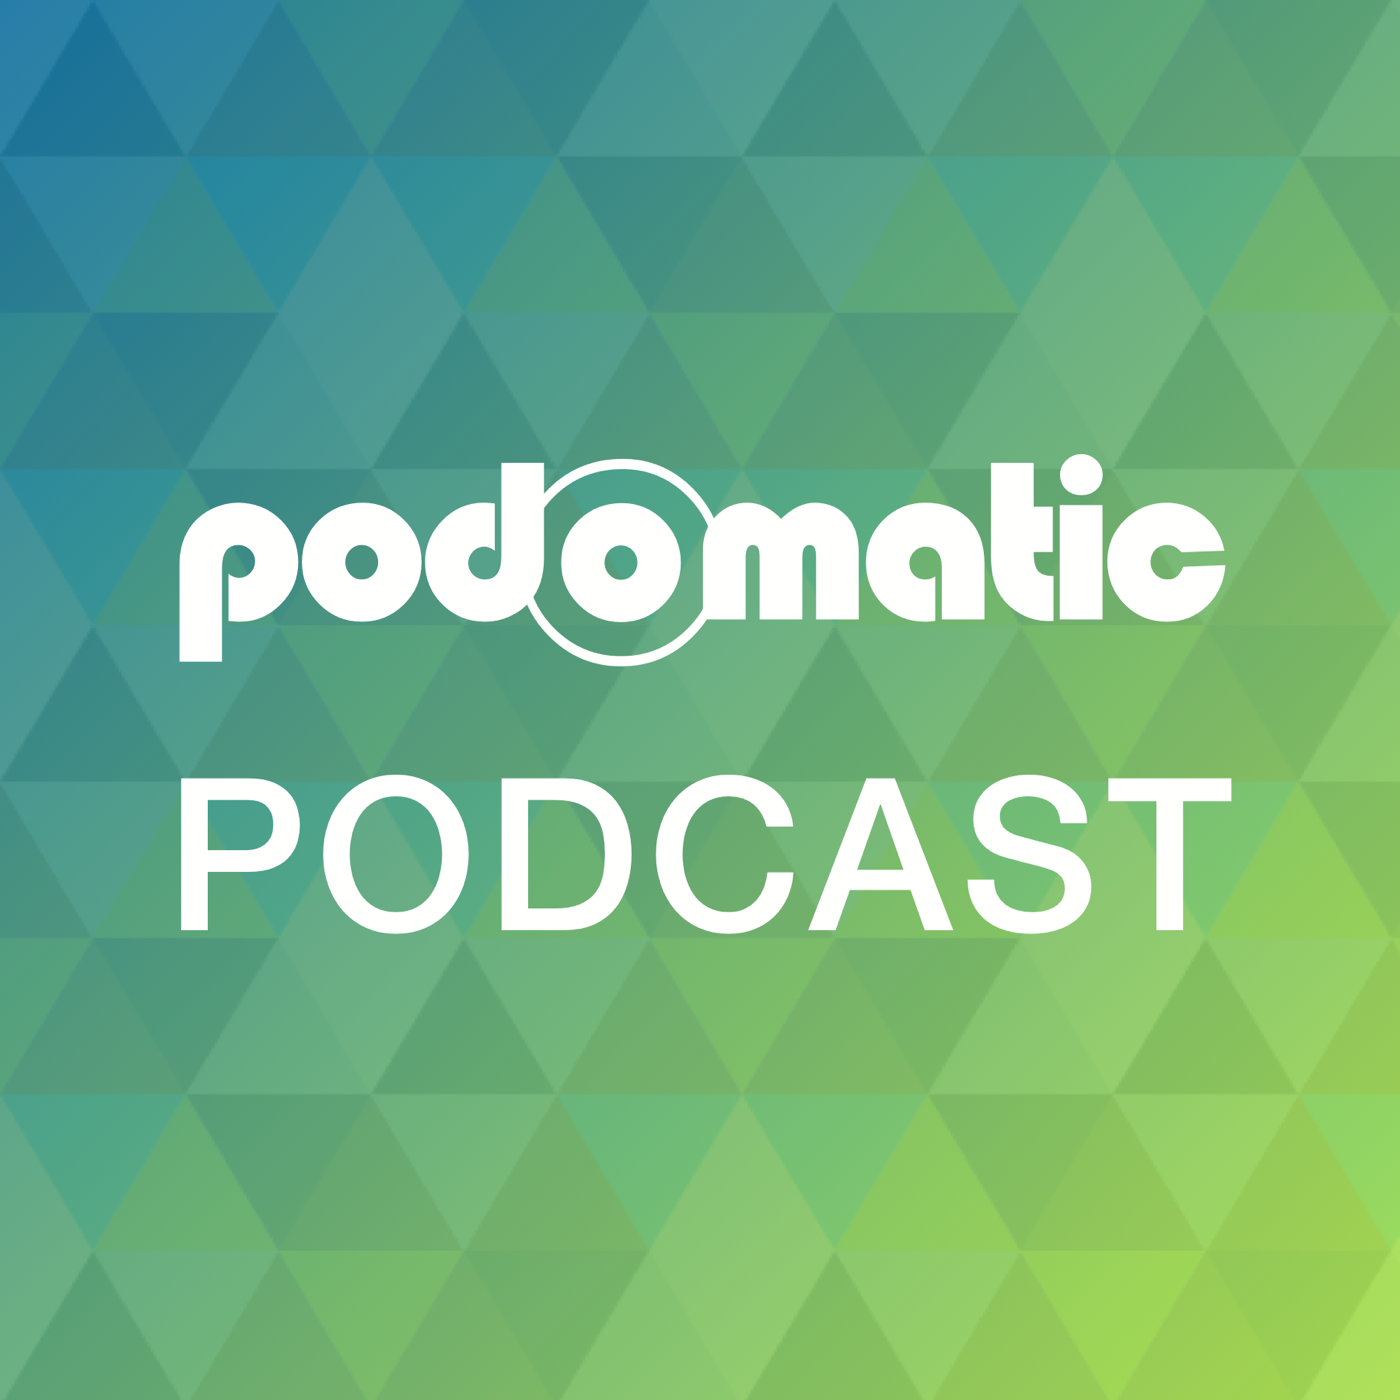 Nicholas Beck's Podcast